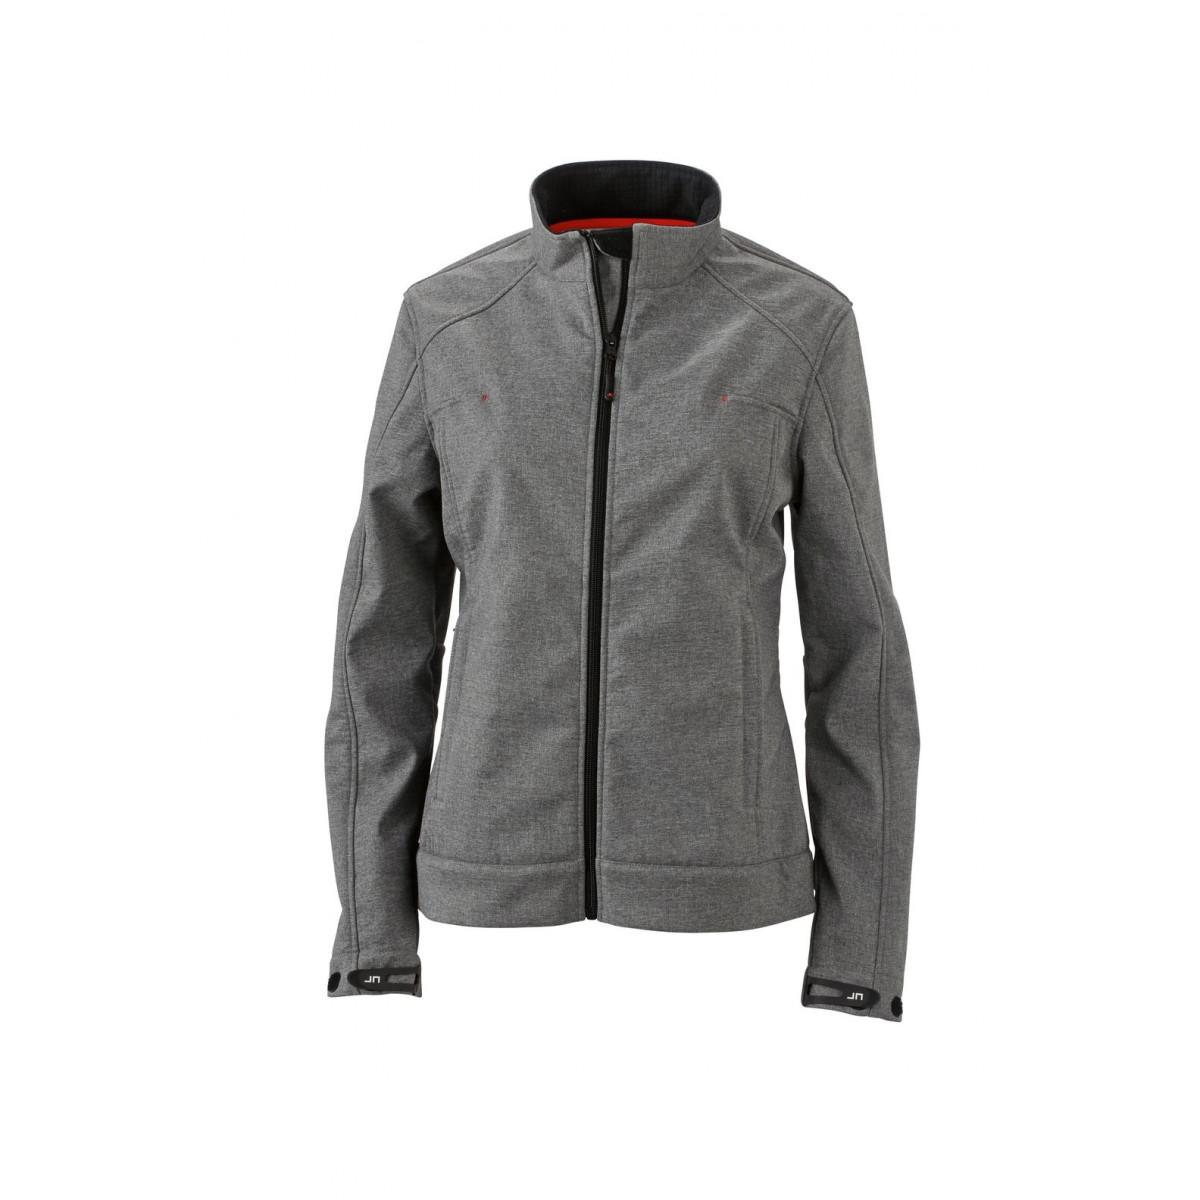 Куртка женская JN1087 Ladies Softshell Jacket - Светло-серый меланж